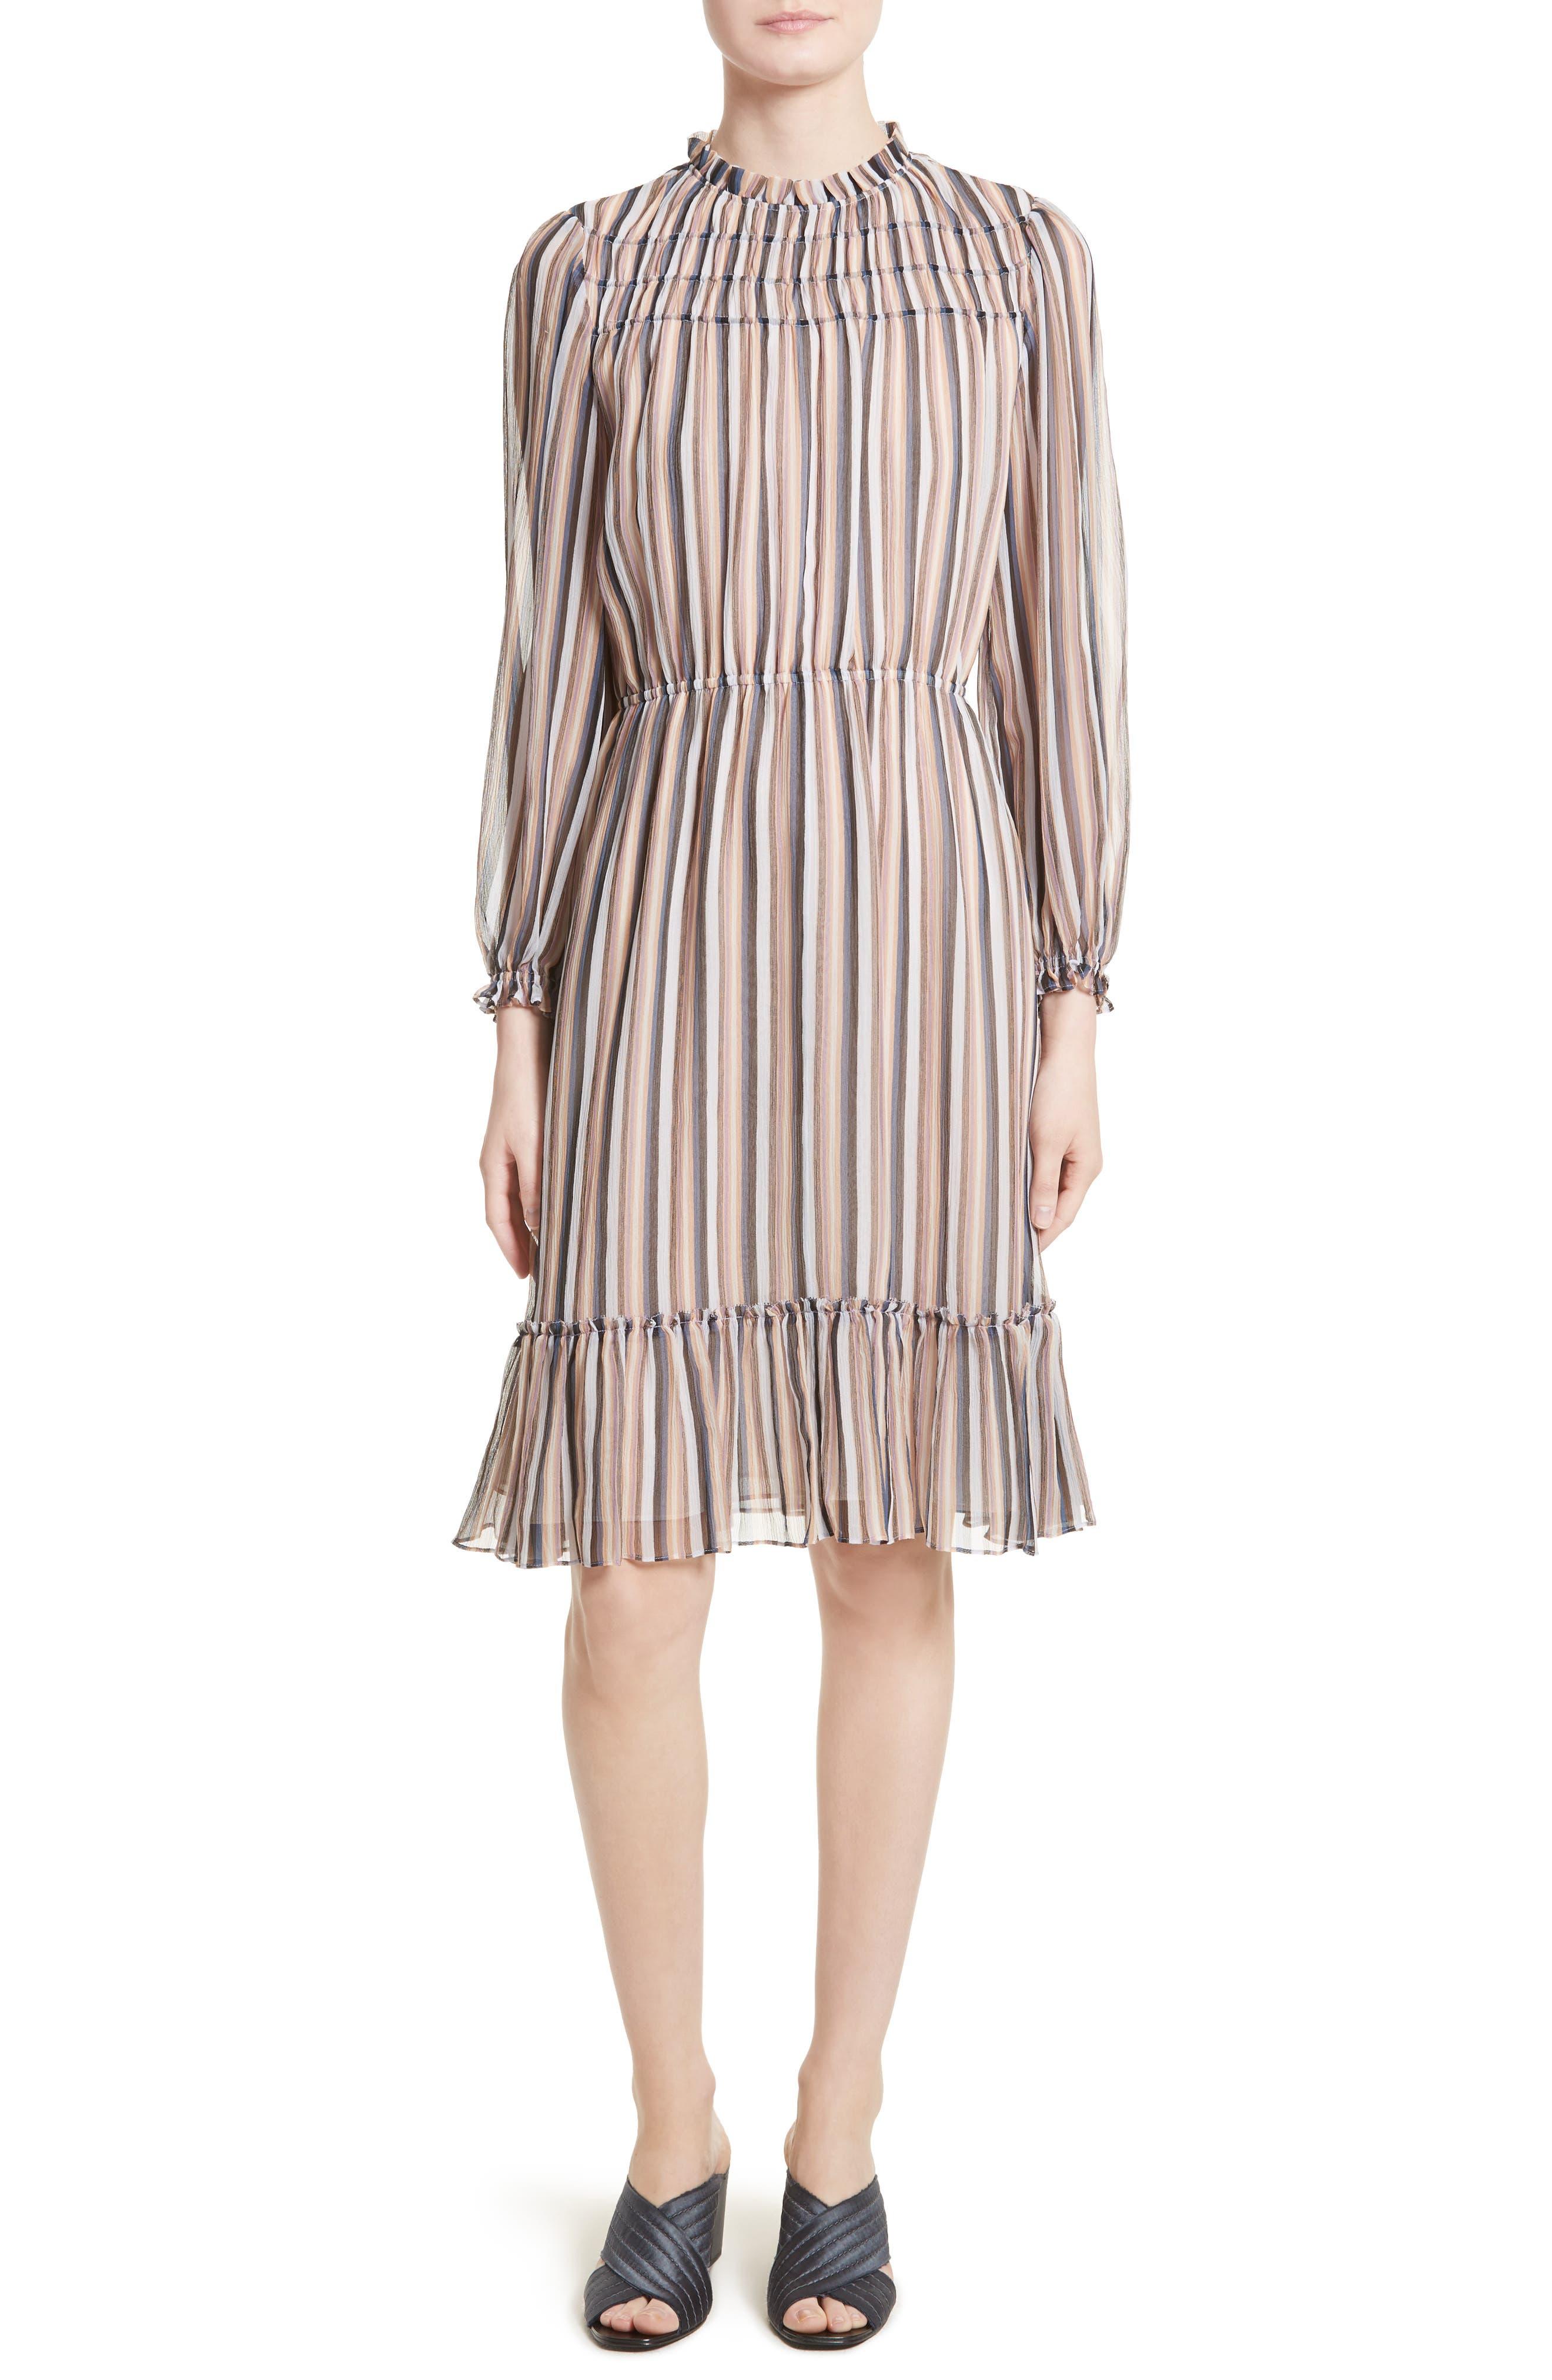 Alternate Image 1 Selected - Derek Lam 10 Crosby Stripe Ruffle Dress